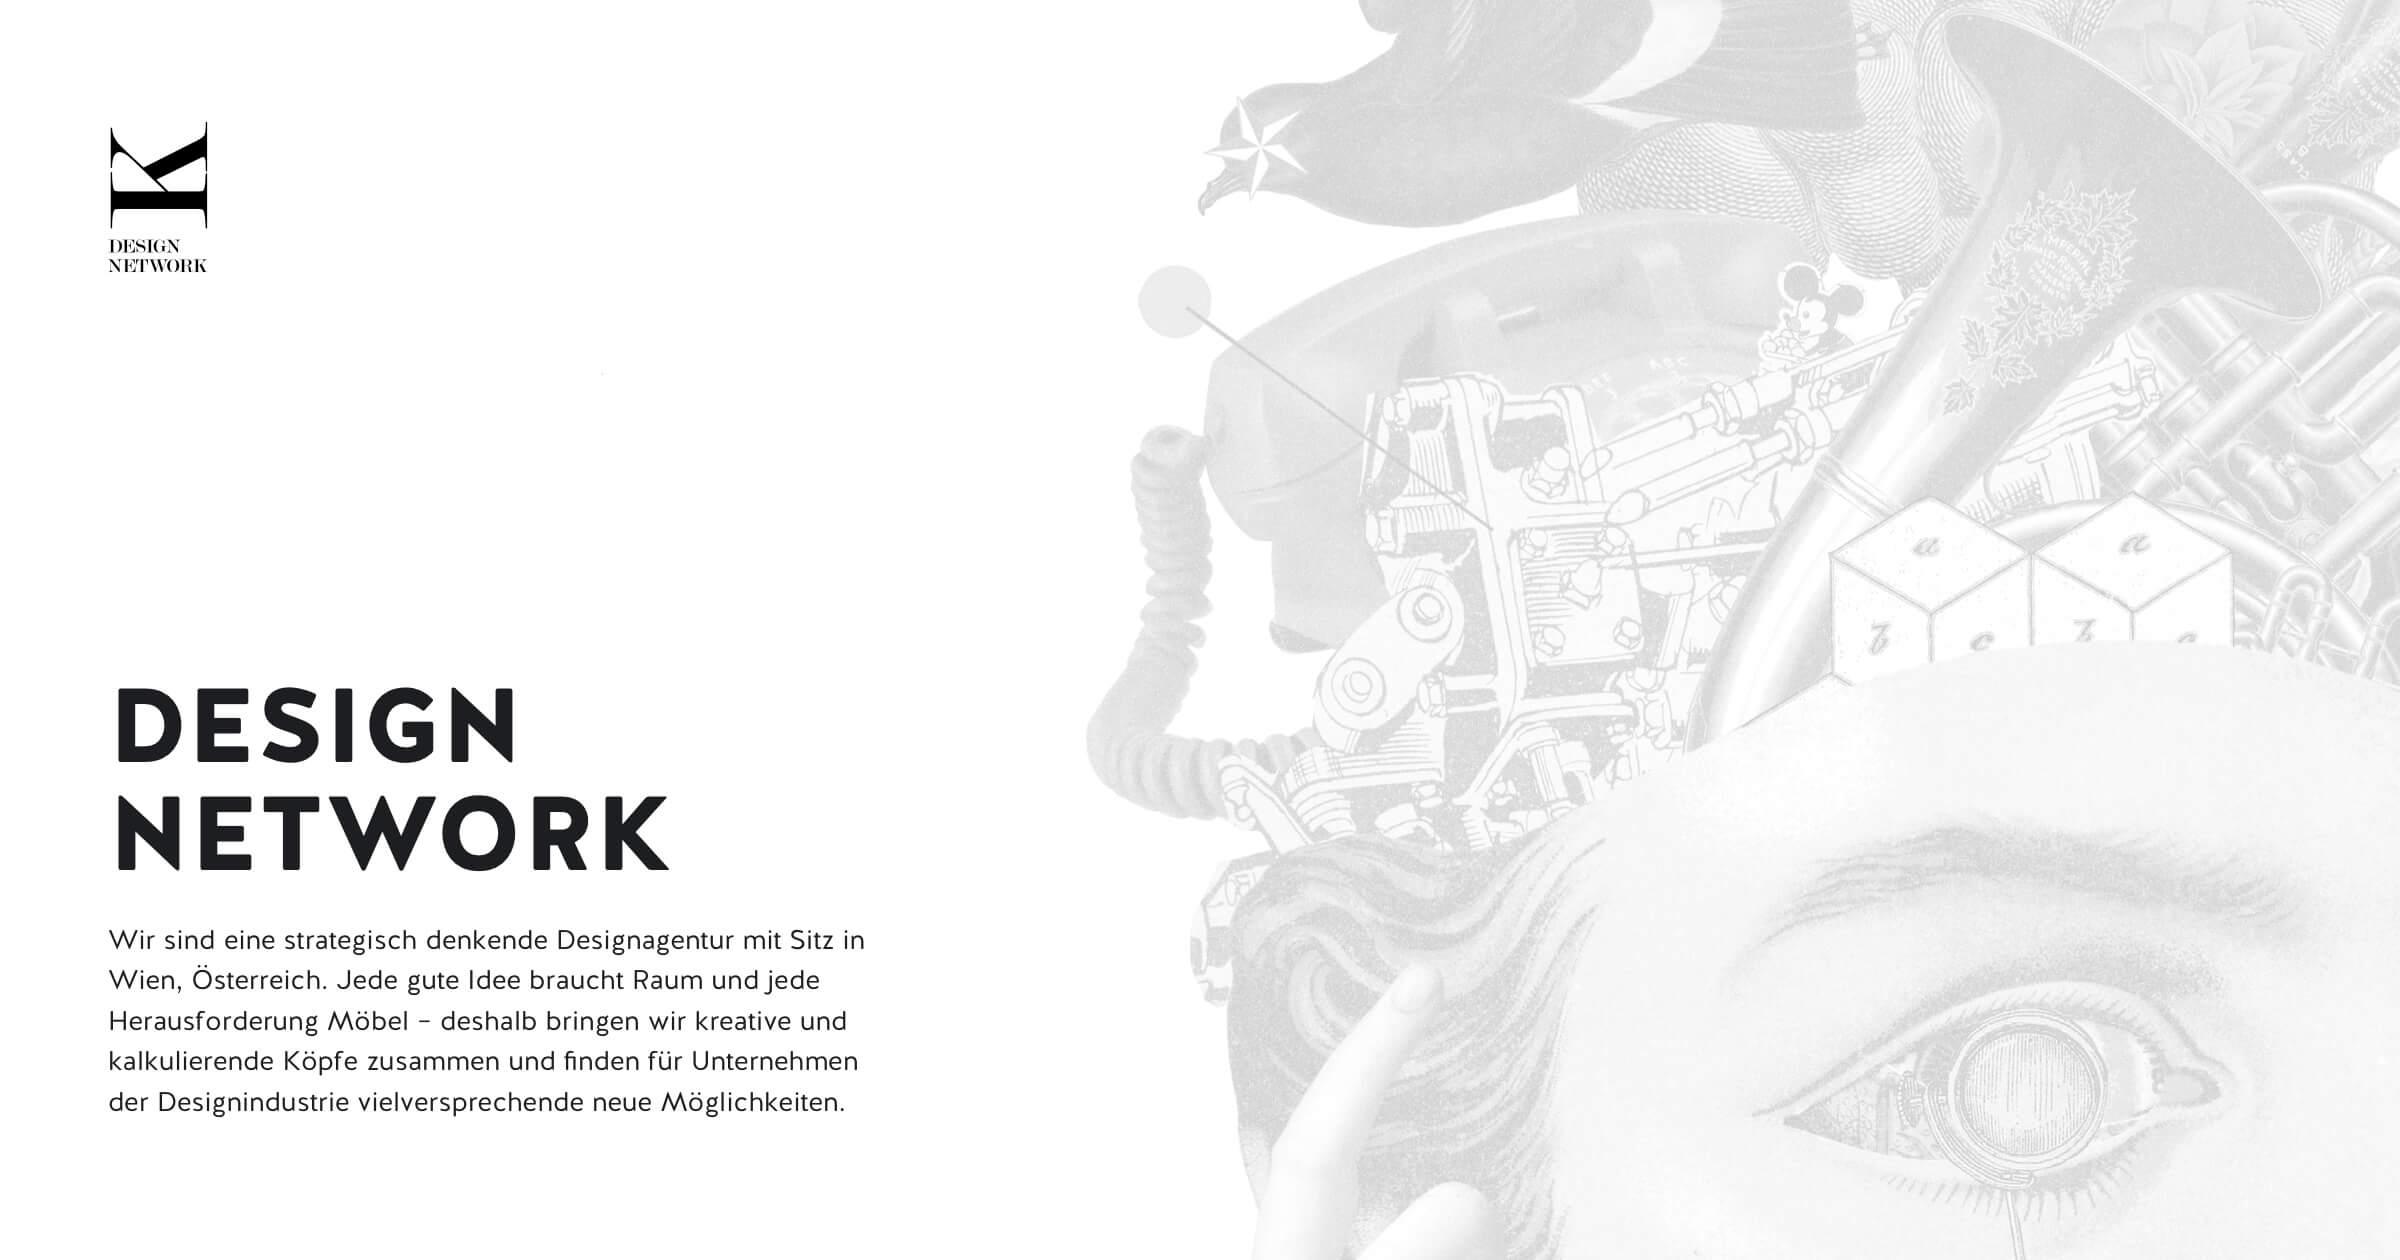 Design Network Design Network